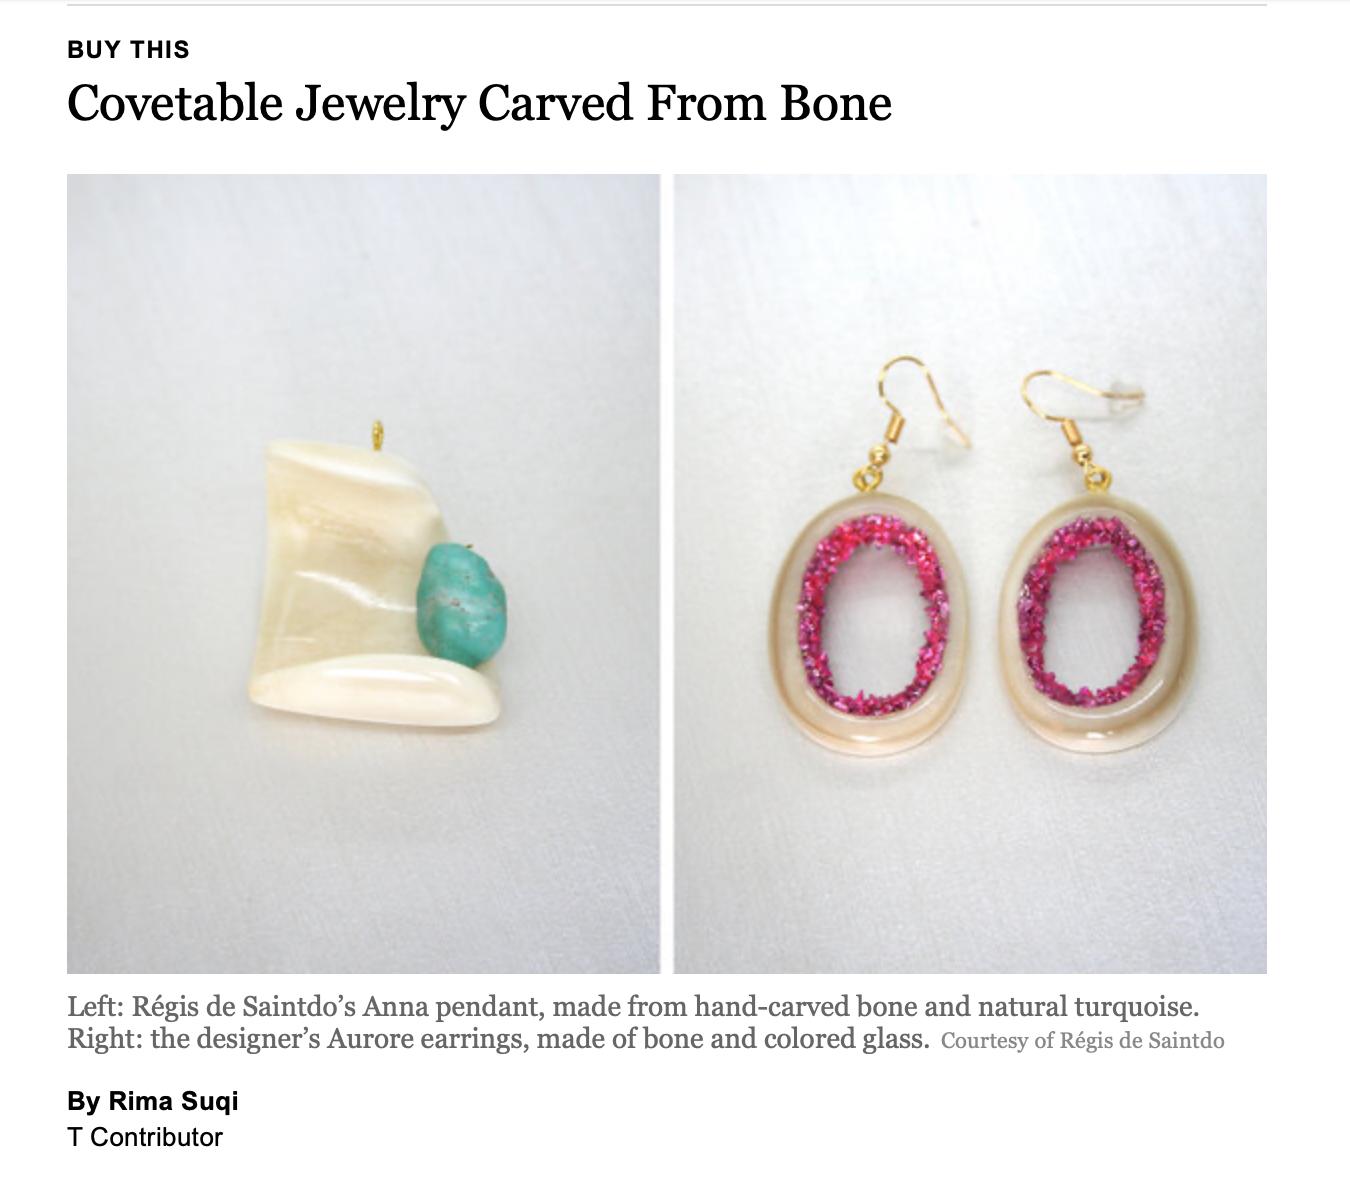 Regis de Saintdo earrings, pendant necklace, NYT Rima Suqi